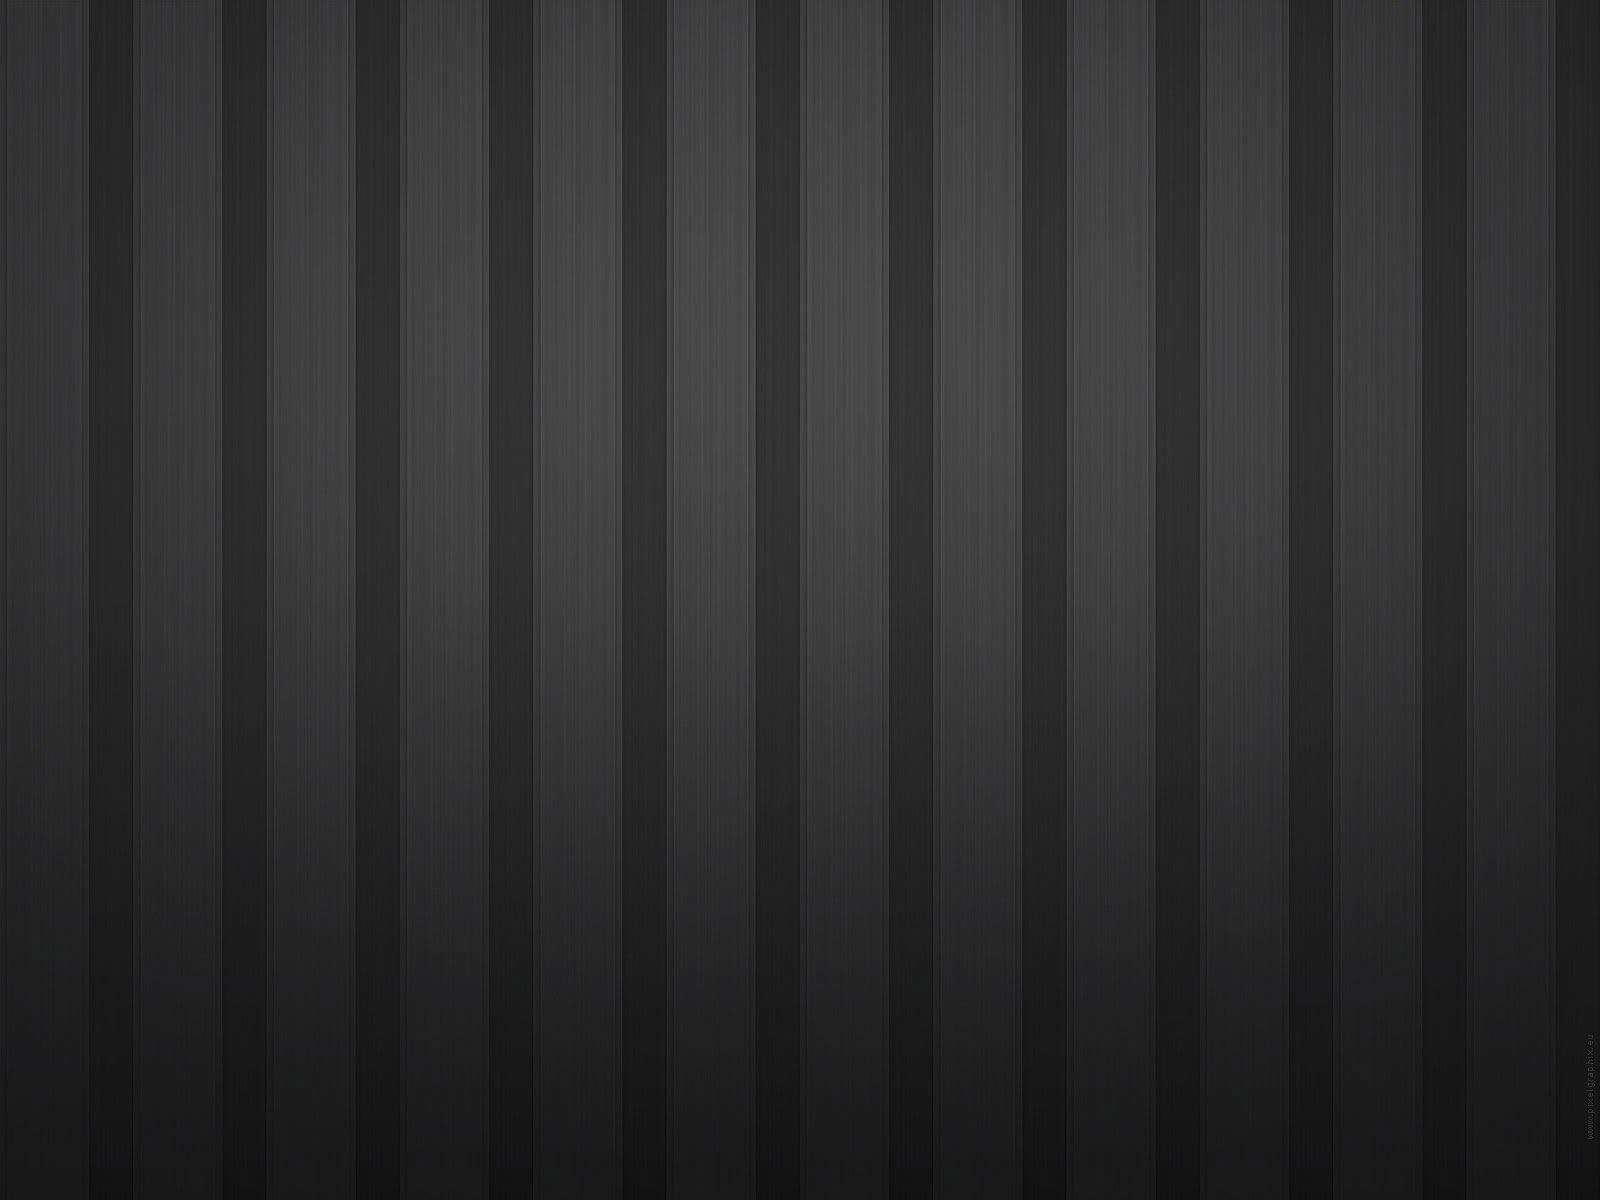 Black and Grey Stripes 1600x1200